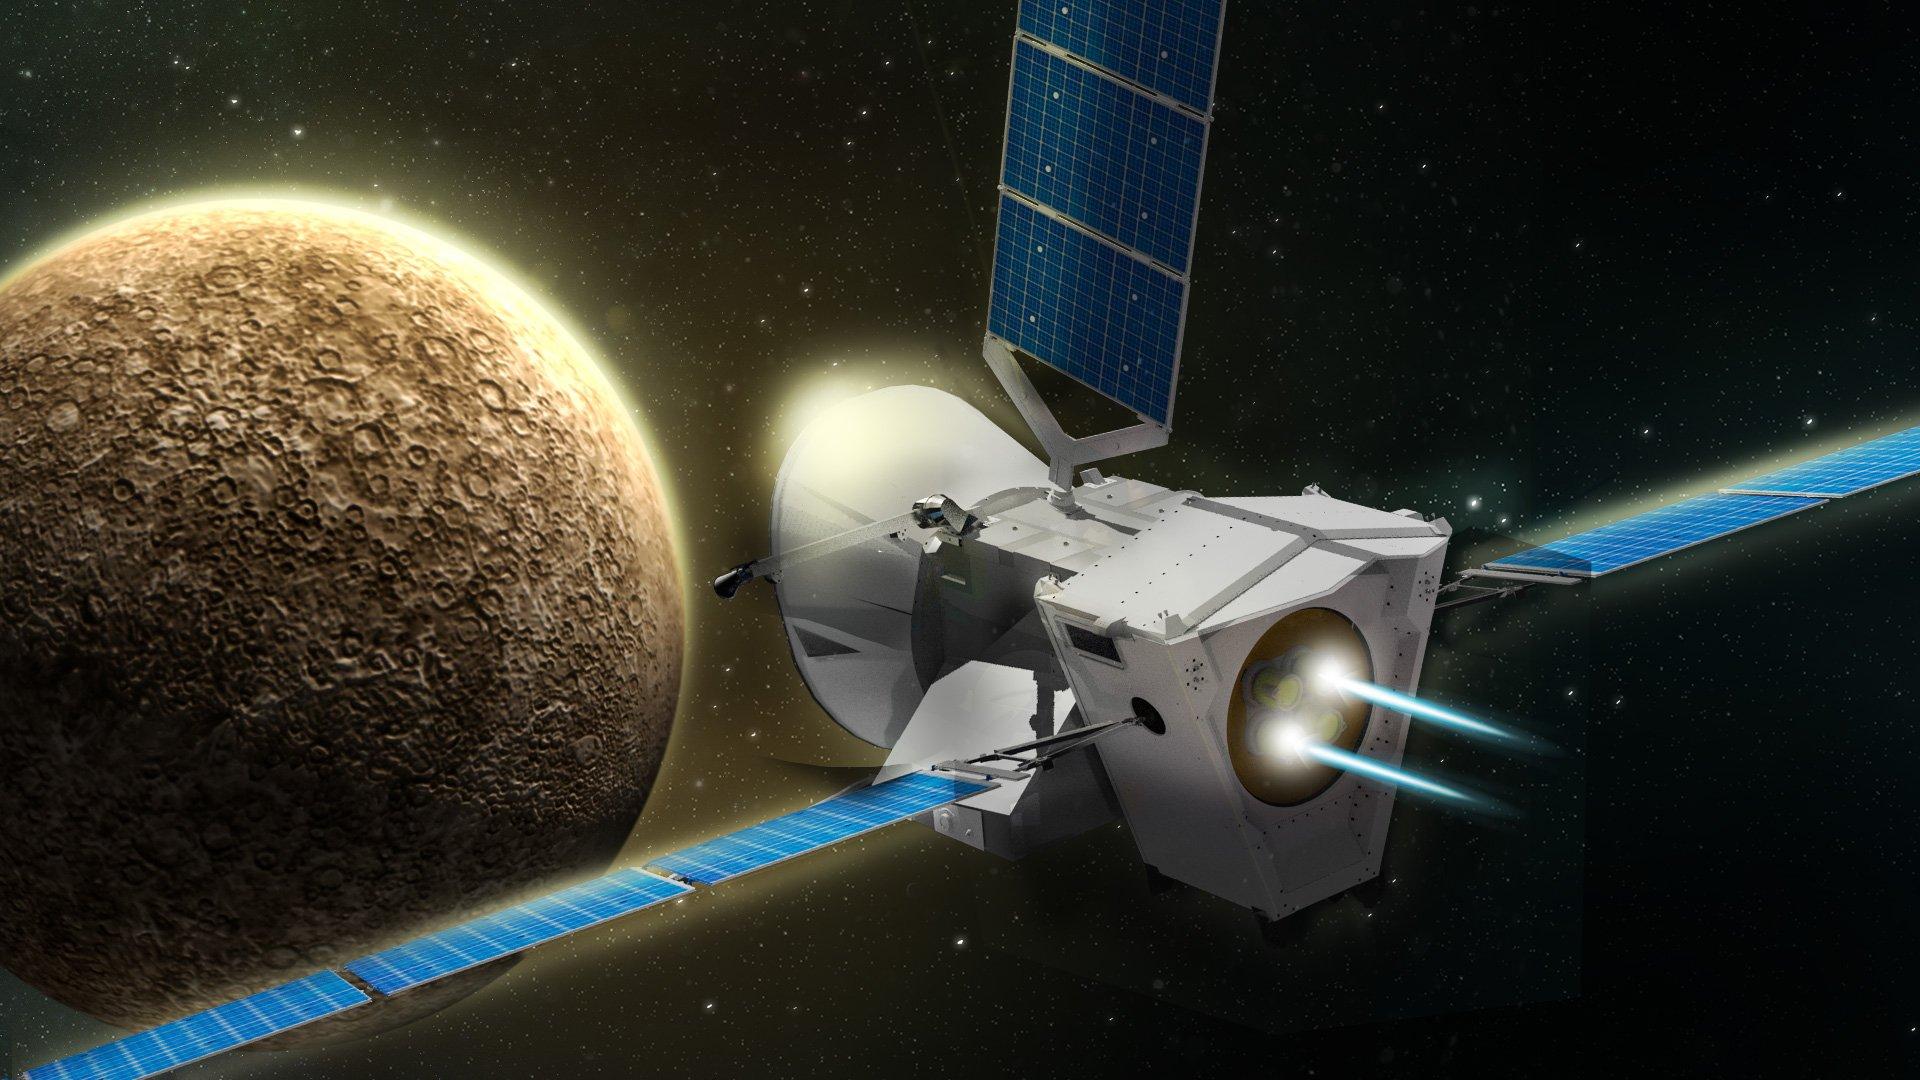 Európai űrszonda indul a Merkúrhoz